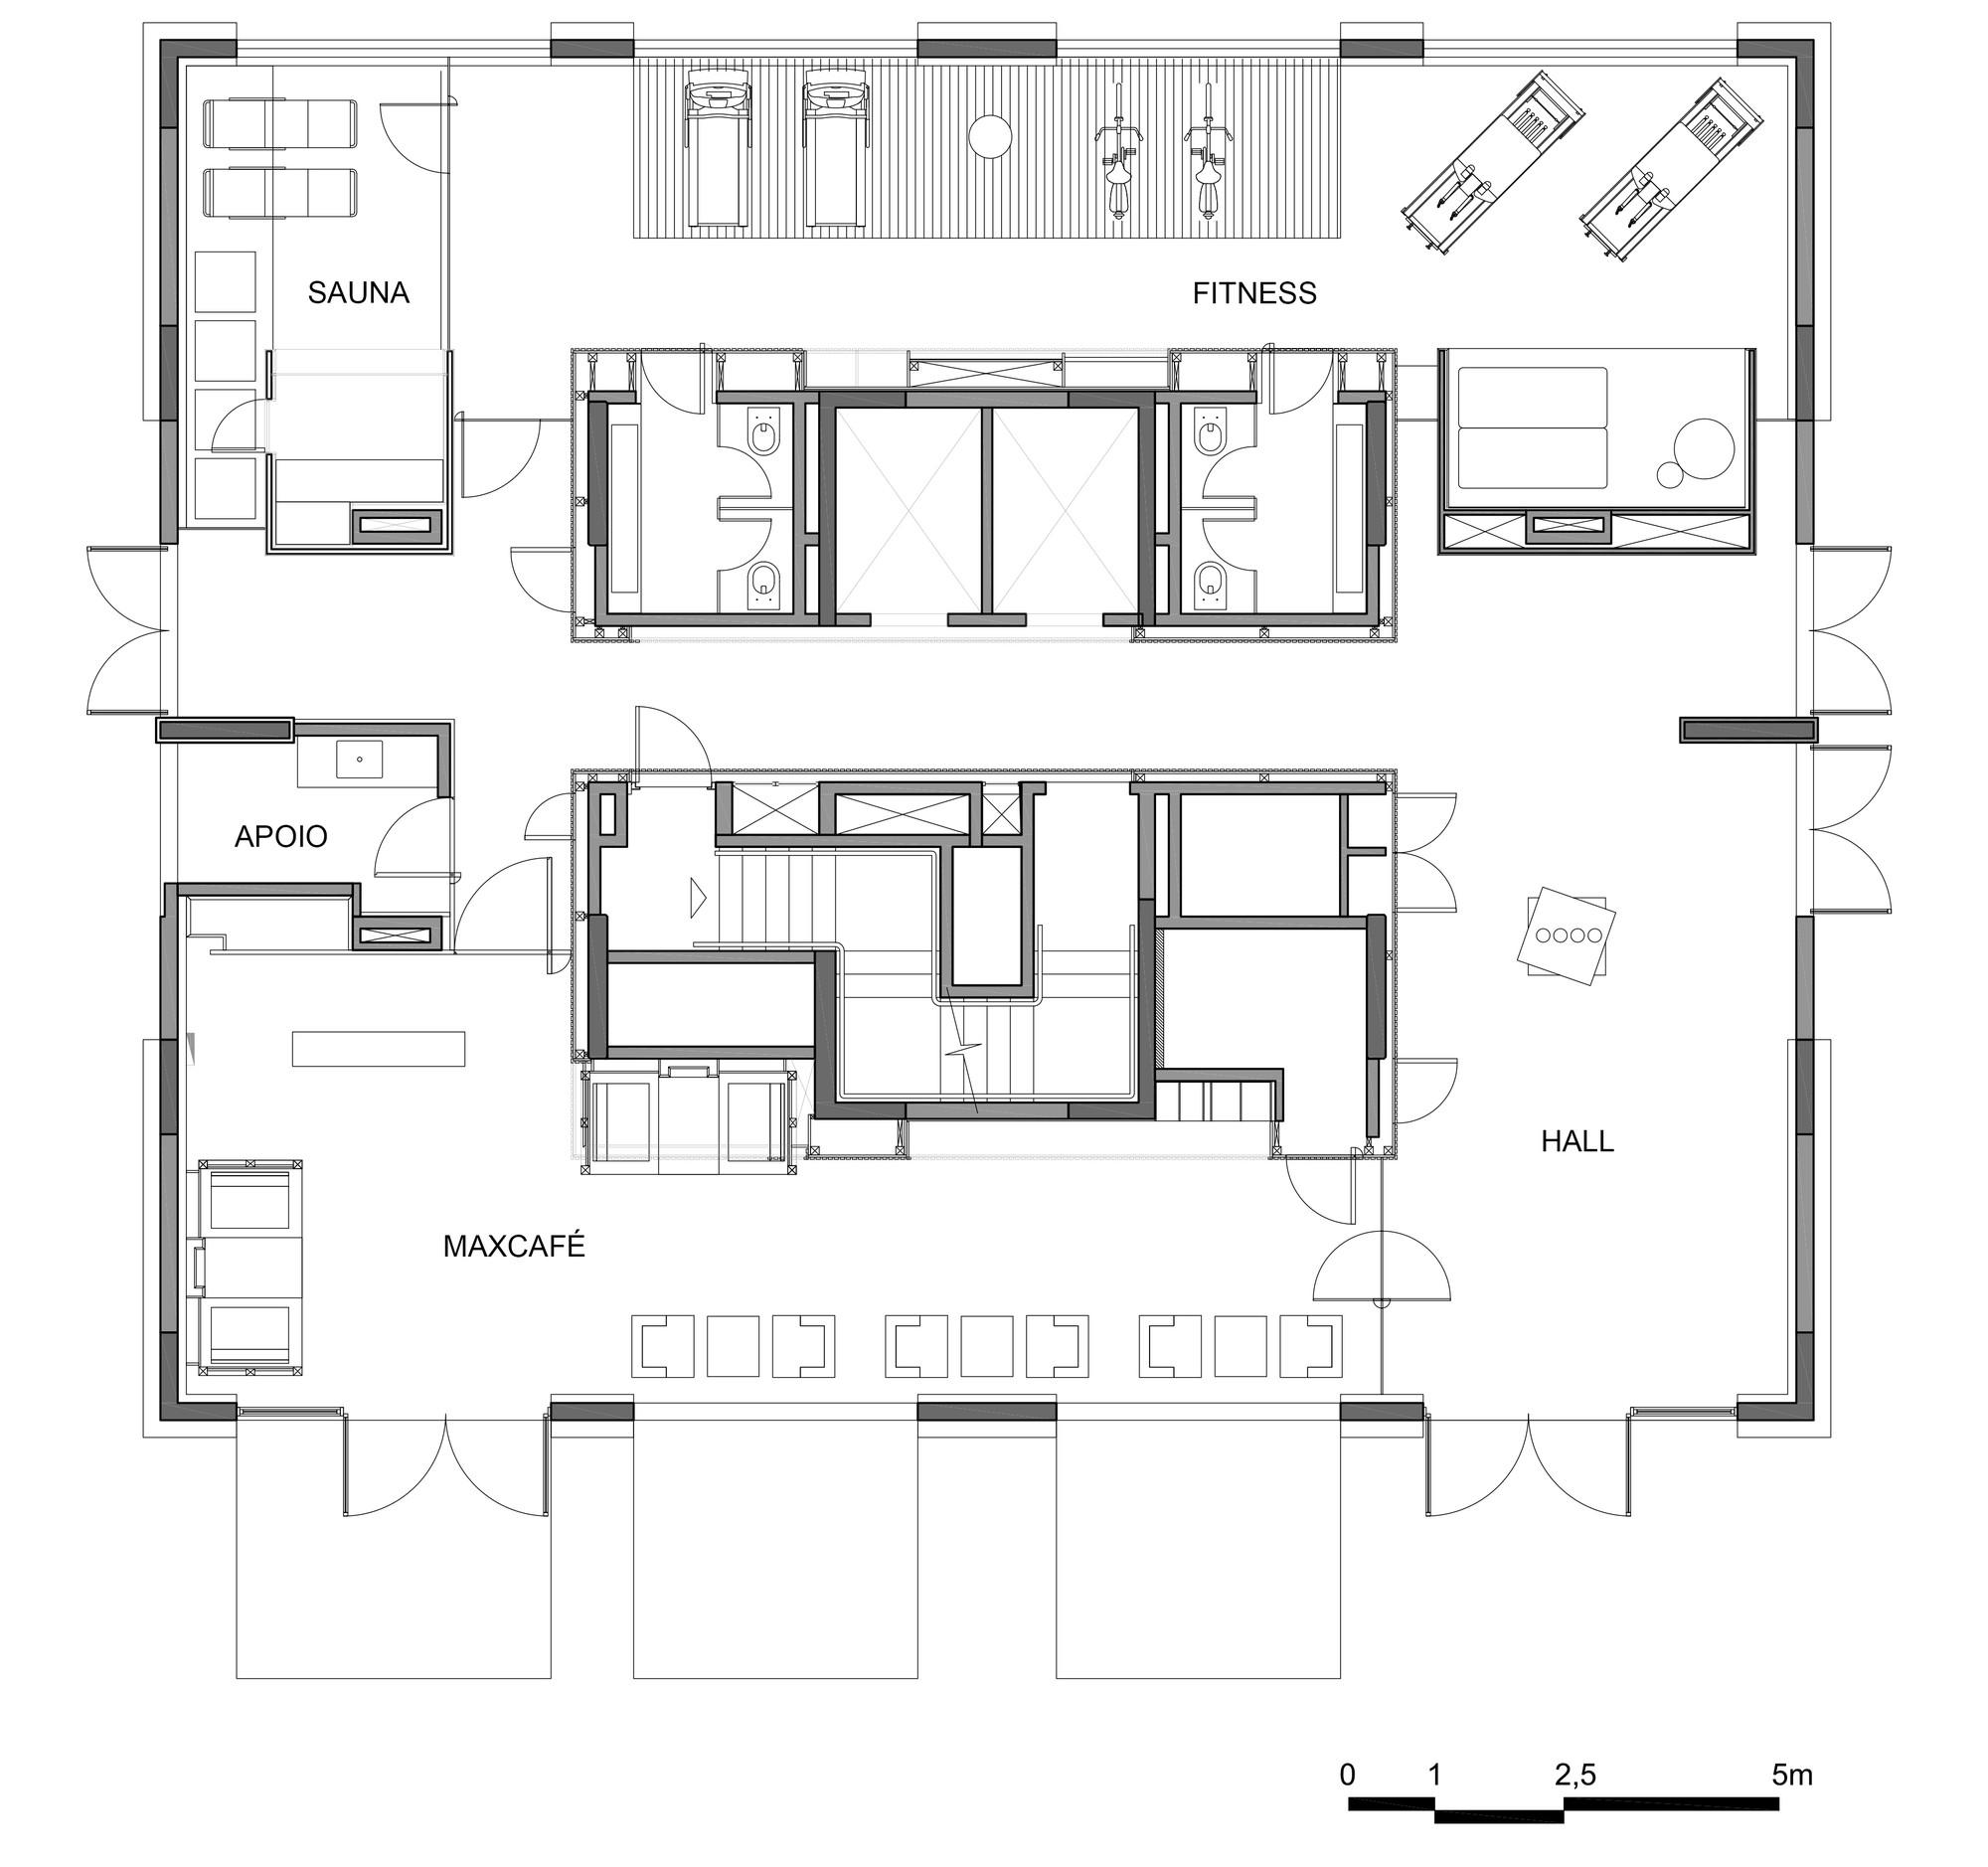 Desenhar Planta De Casas Gratis Em Portugues Edificio Campo Belo Roccovidal Perkins Will Plataforma